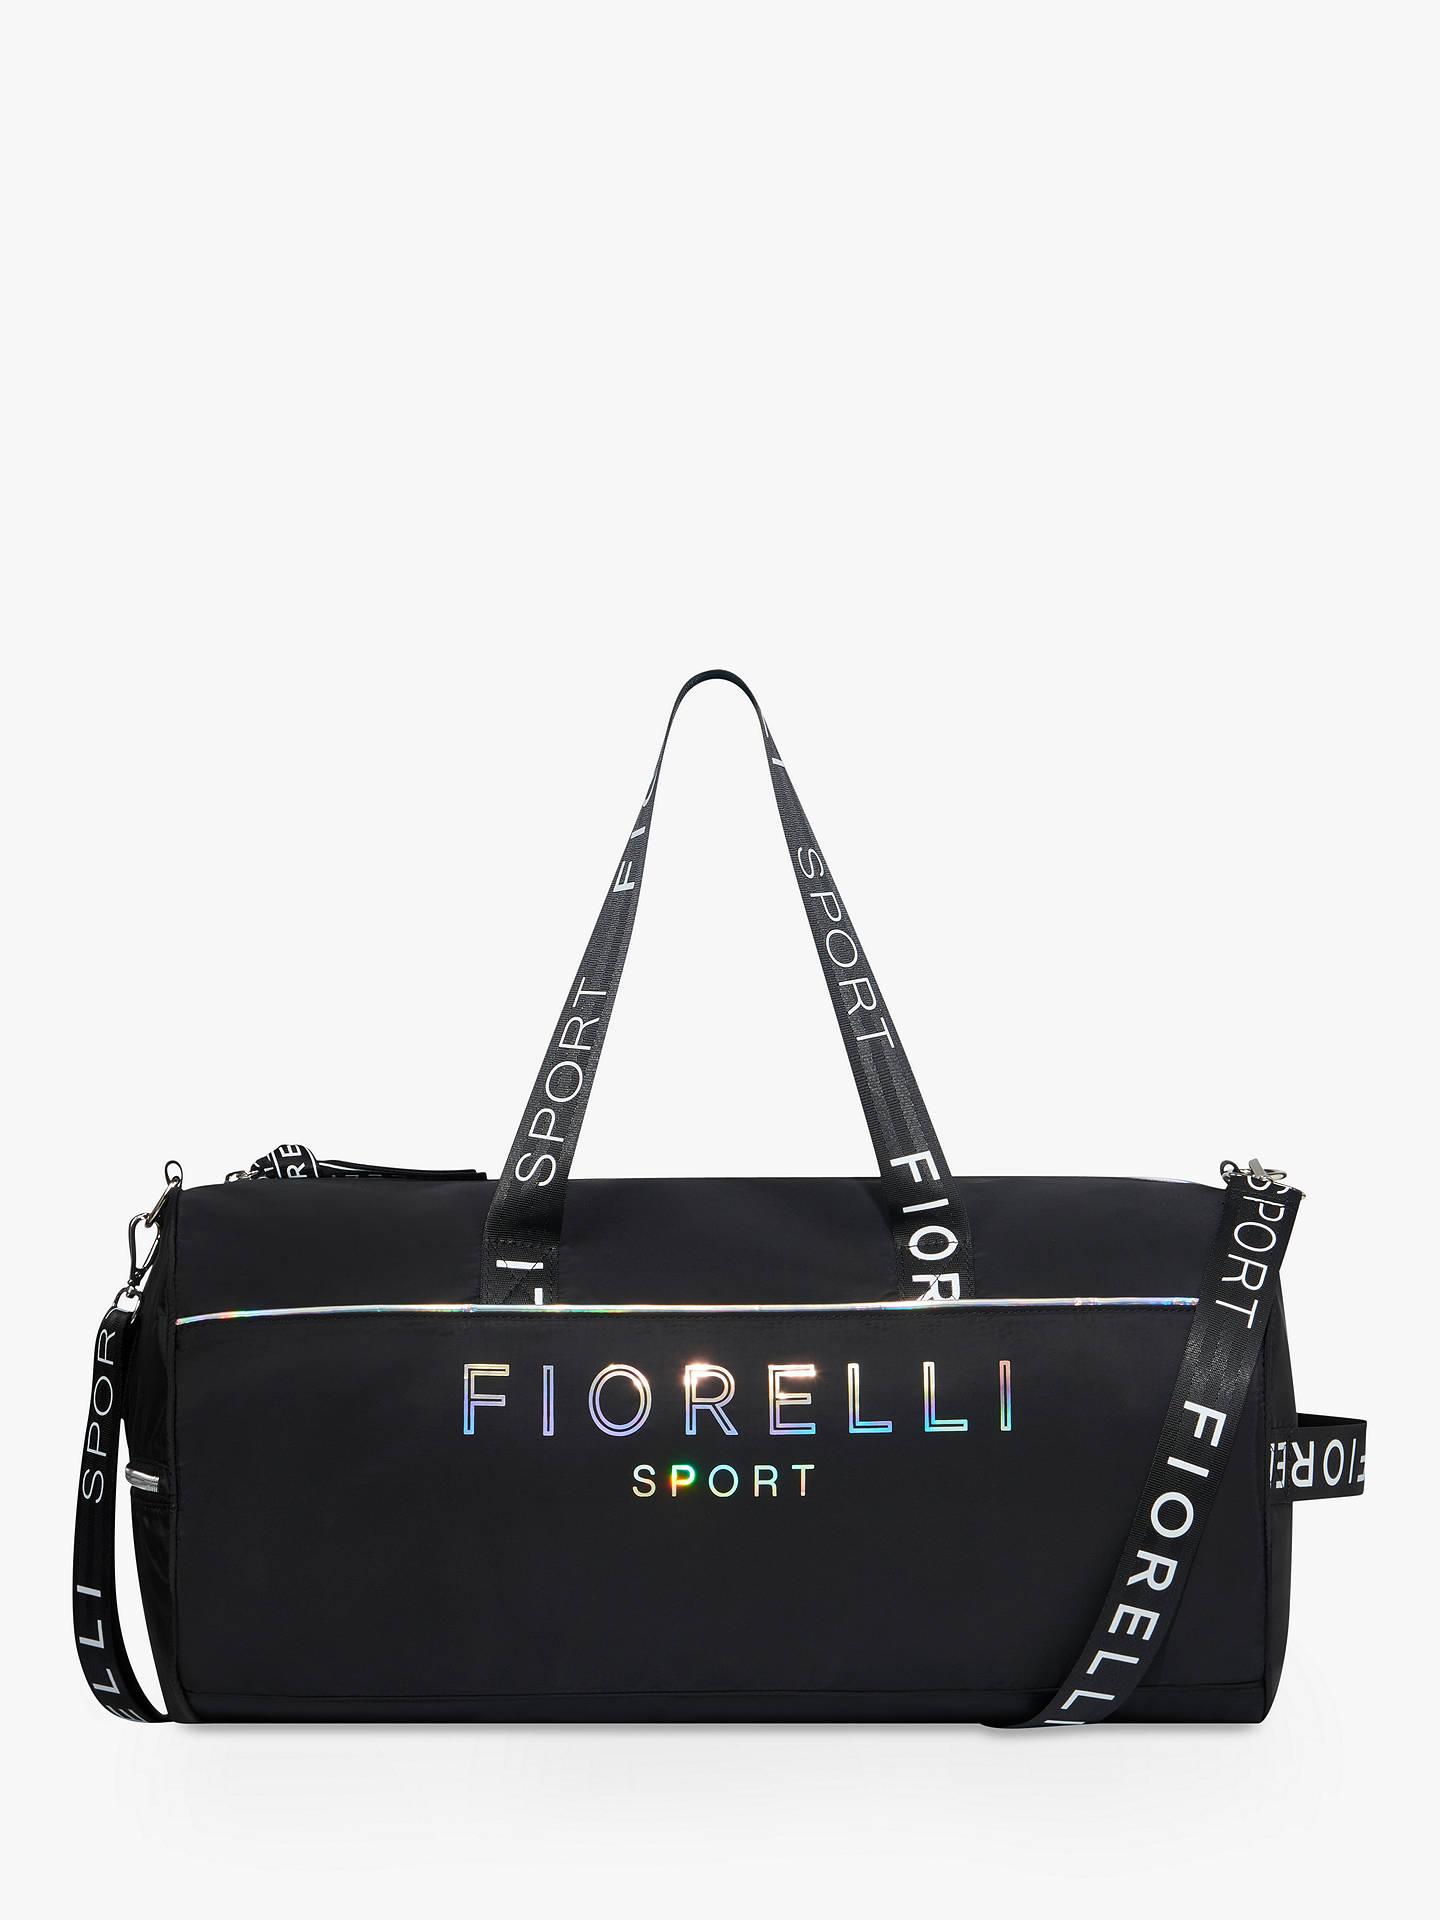 fiorelli sport shoulder bag